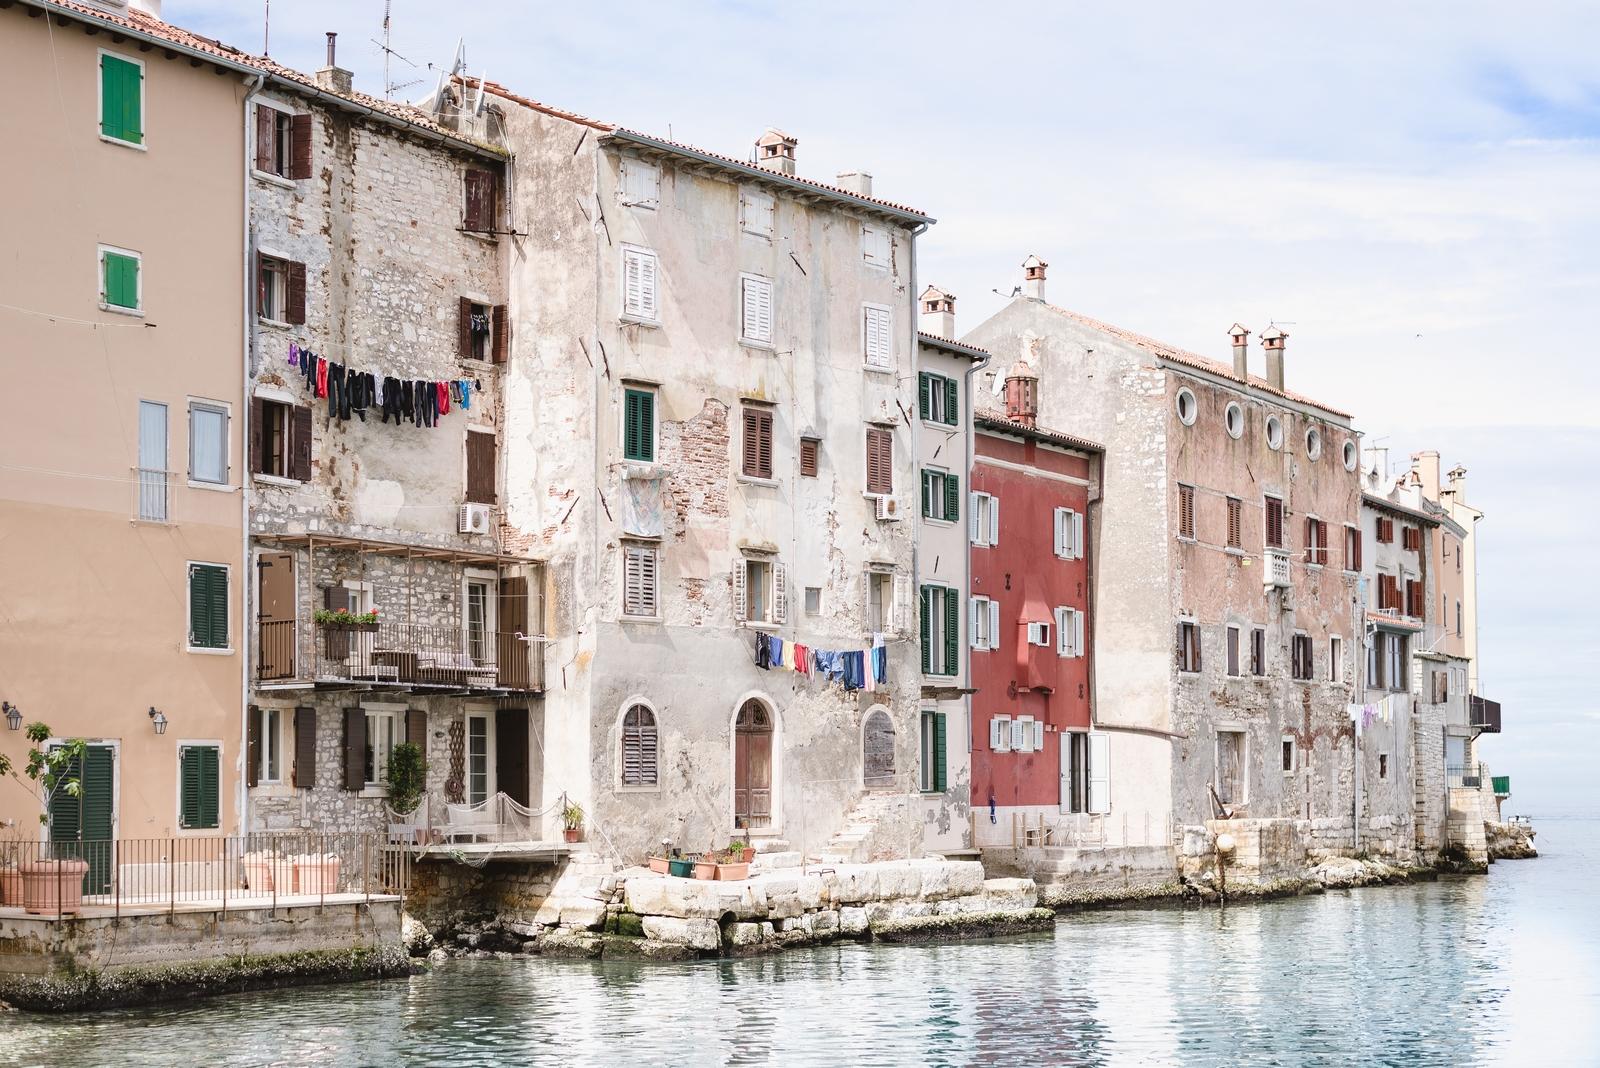 Rovinj, the most beautiful city in Istria, Croatia - from travel blog http://Epepa.eu